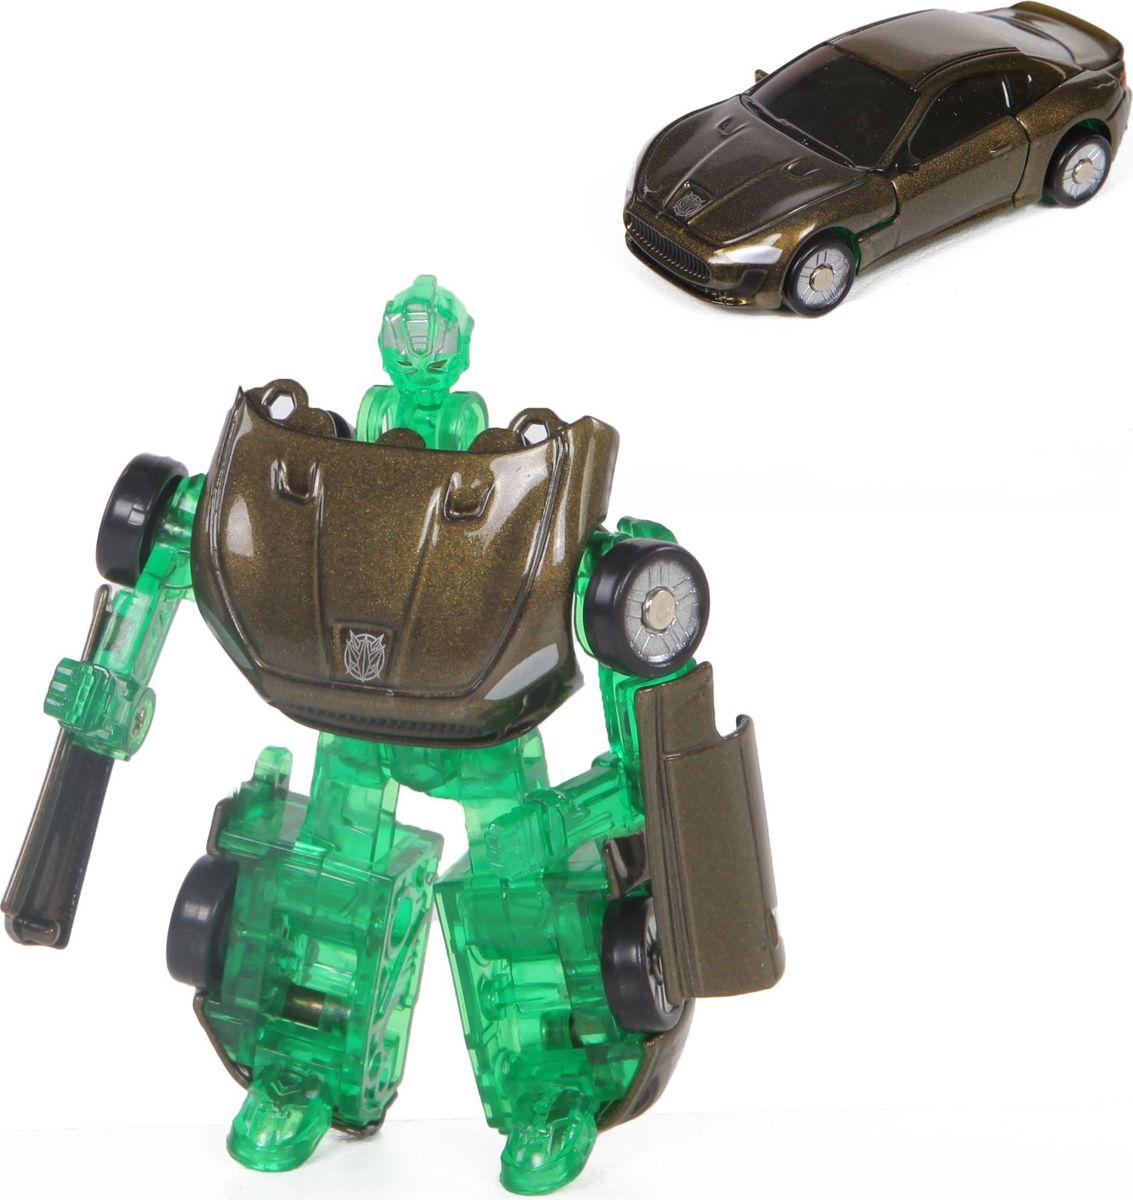 Yako Робот-трансформер цвет хаки Y3686144-2 интерактивные игрушки yako робот y2055209